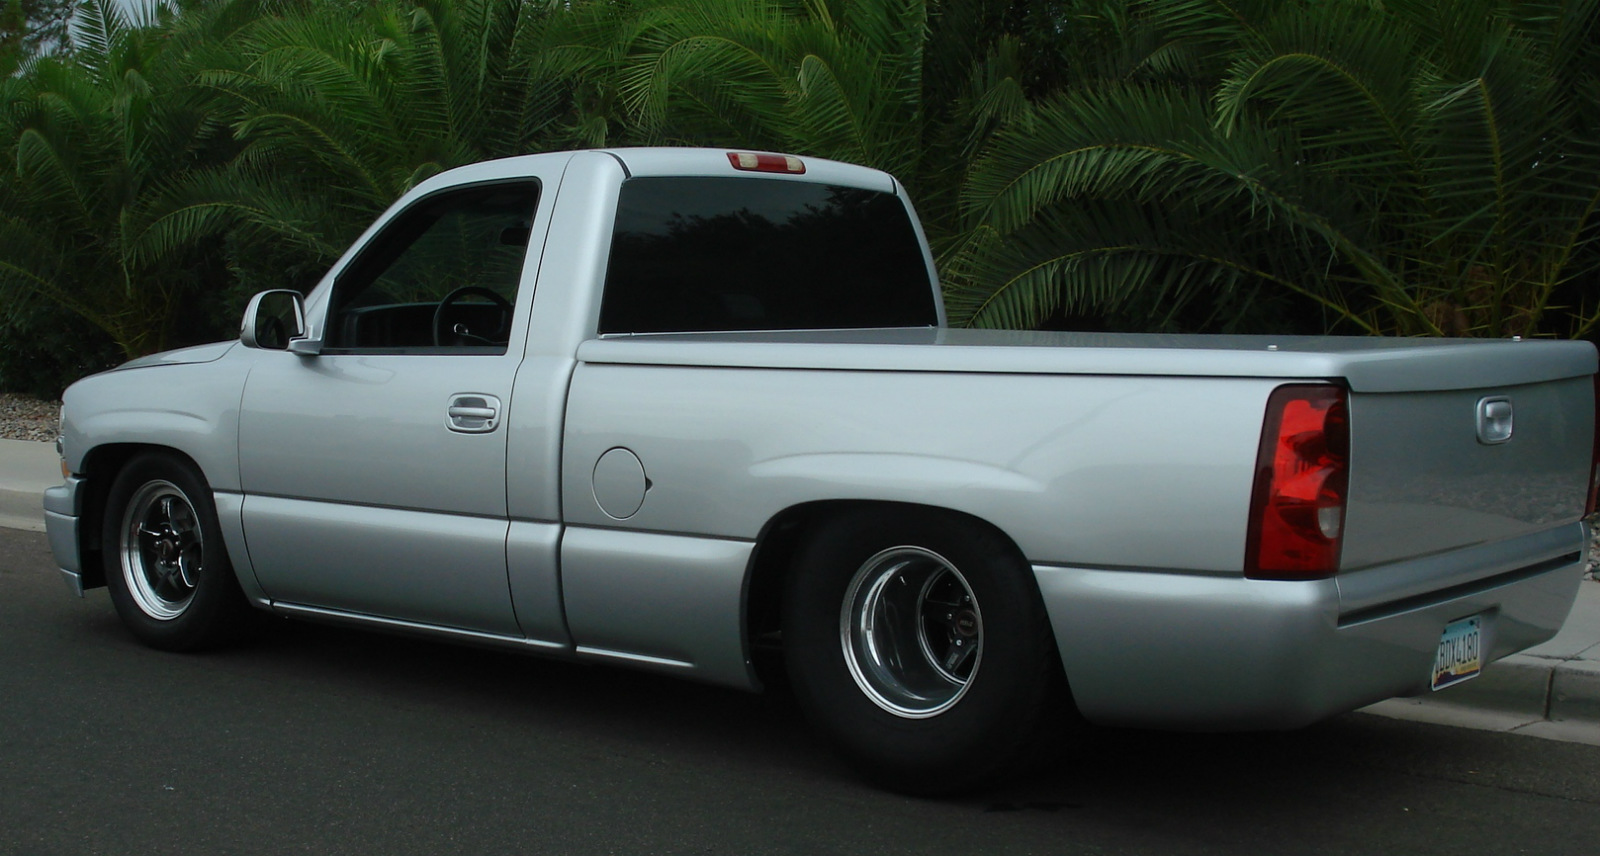 All Chevy chevy 2001 : BangShift.com eBay Find: A Ready-To-Go 2001 Chevrolet Silverado ...